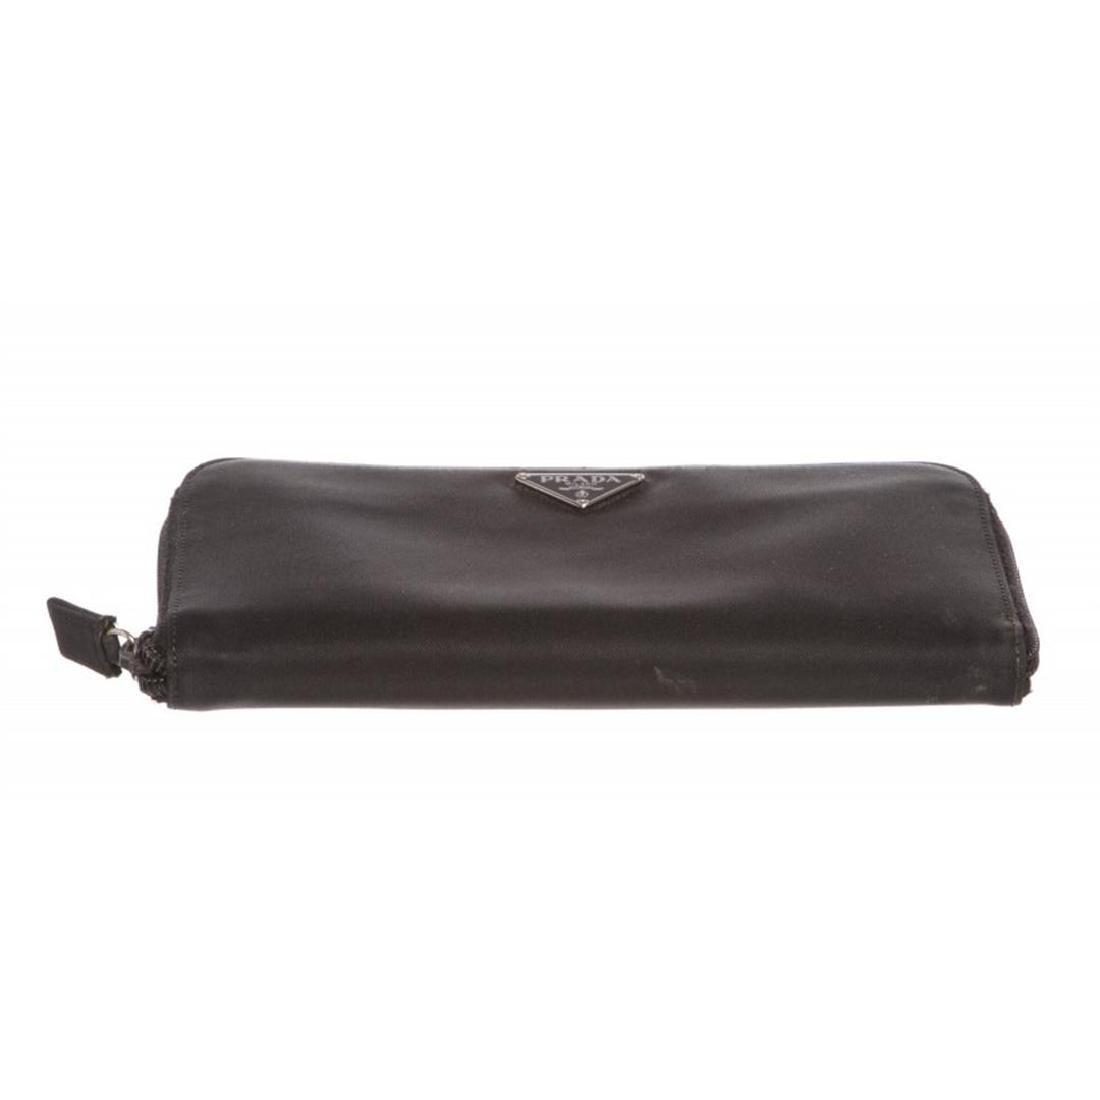 Prada Black Nylon Leather Zipper Wallet - 4